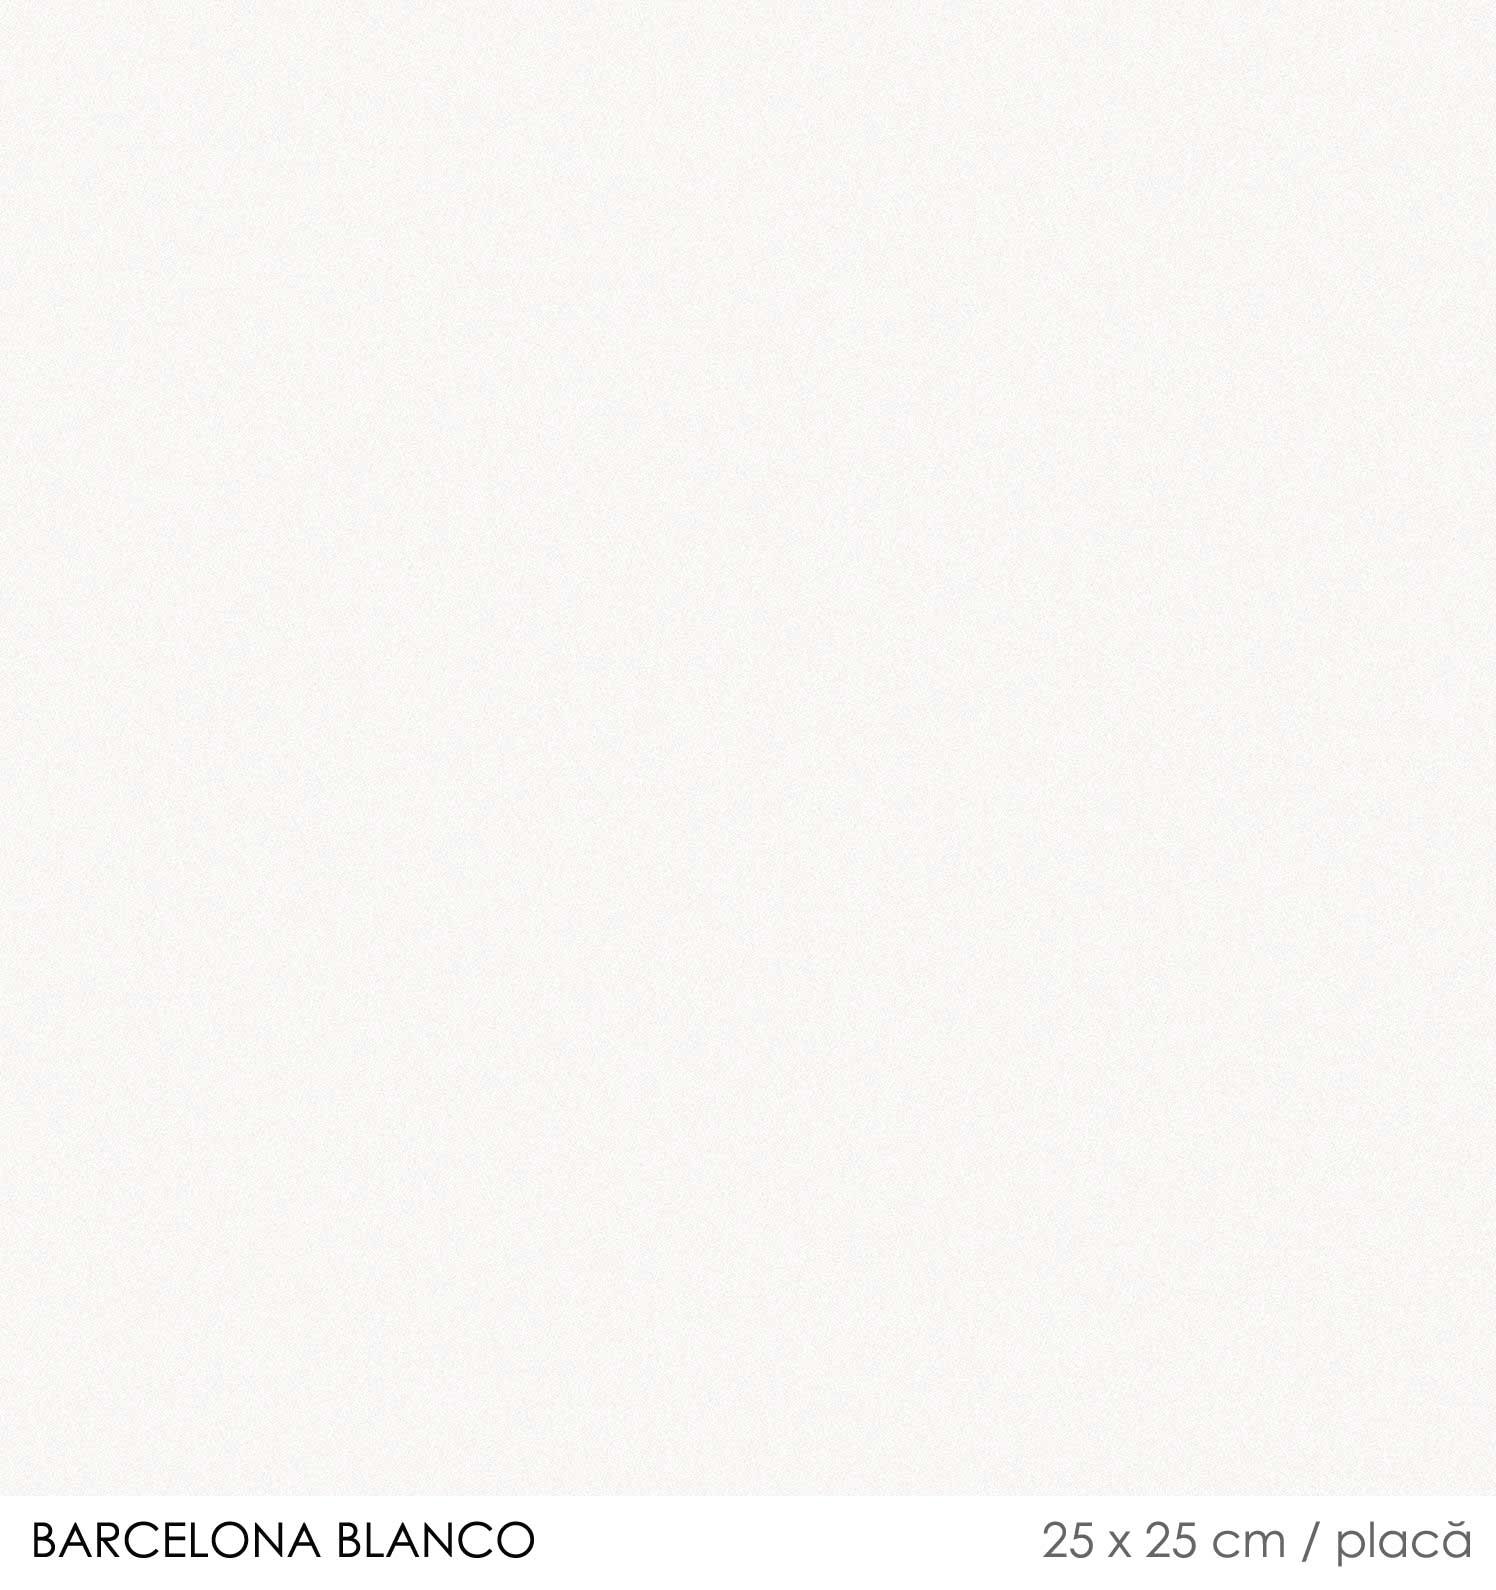 Gresie alba mata 25 x 25 cm Barcelona